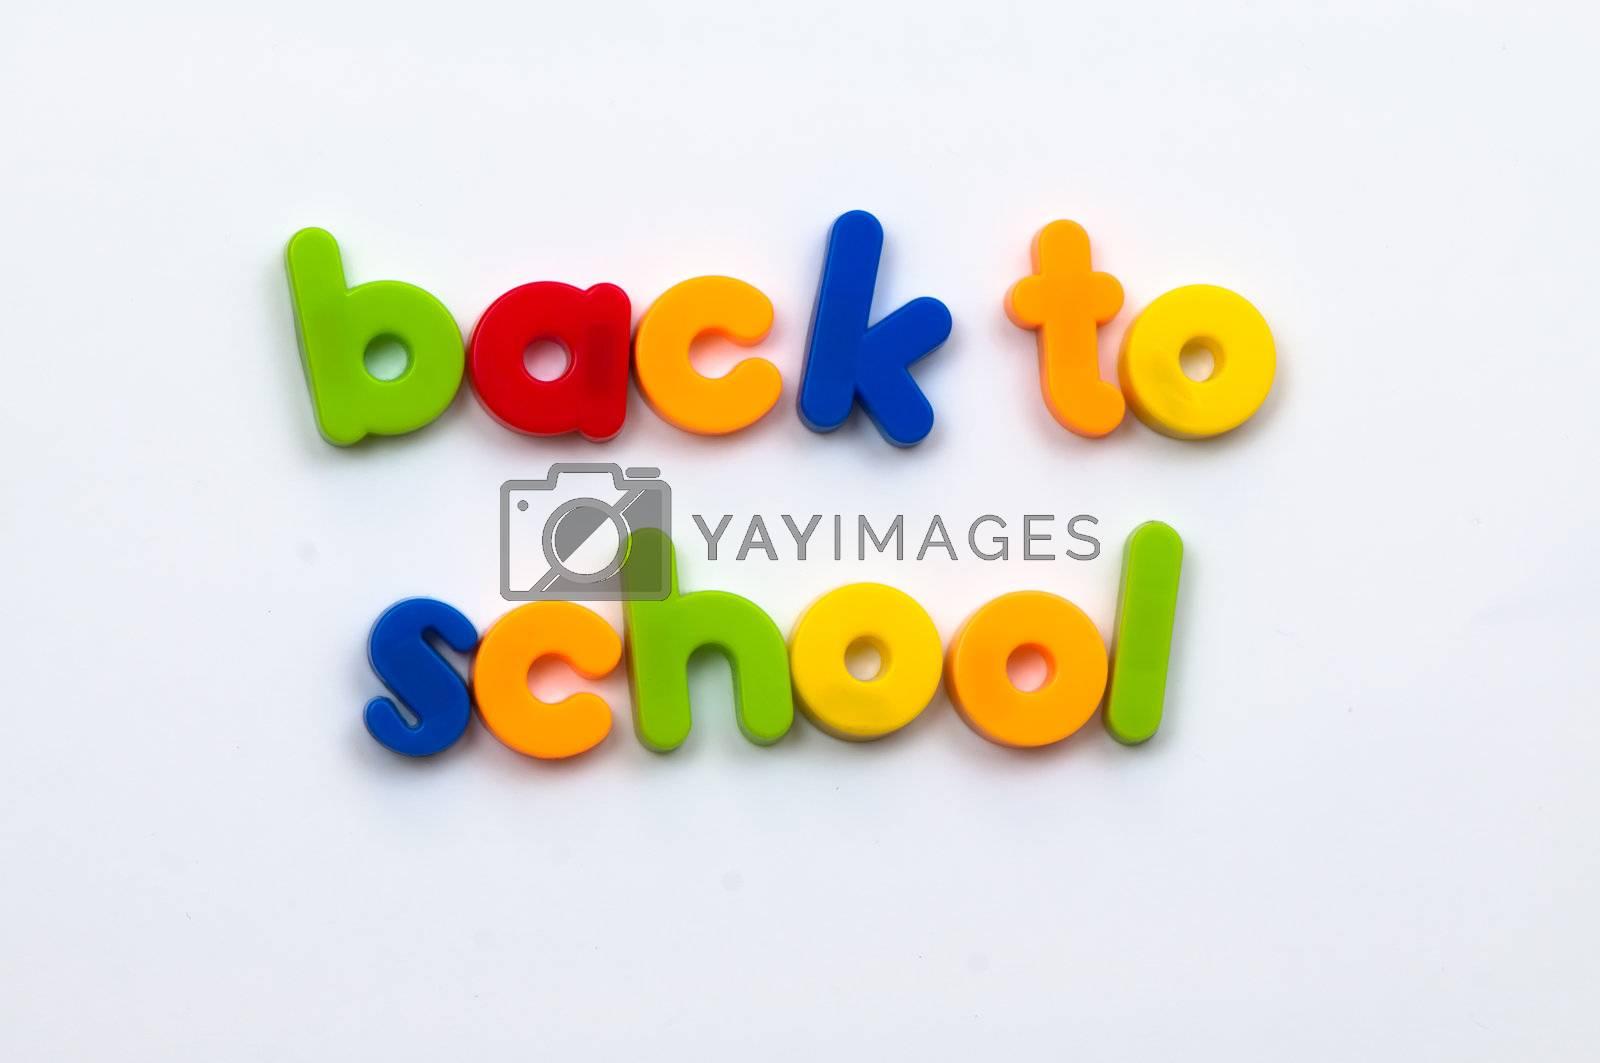 Back to school fridge magnet letters